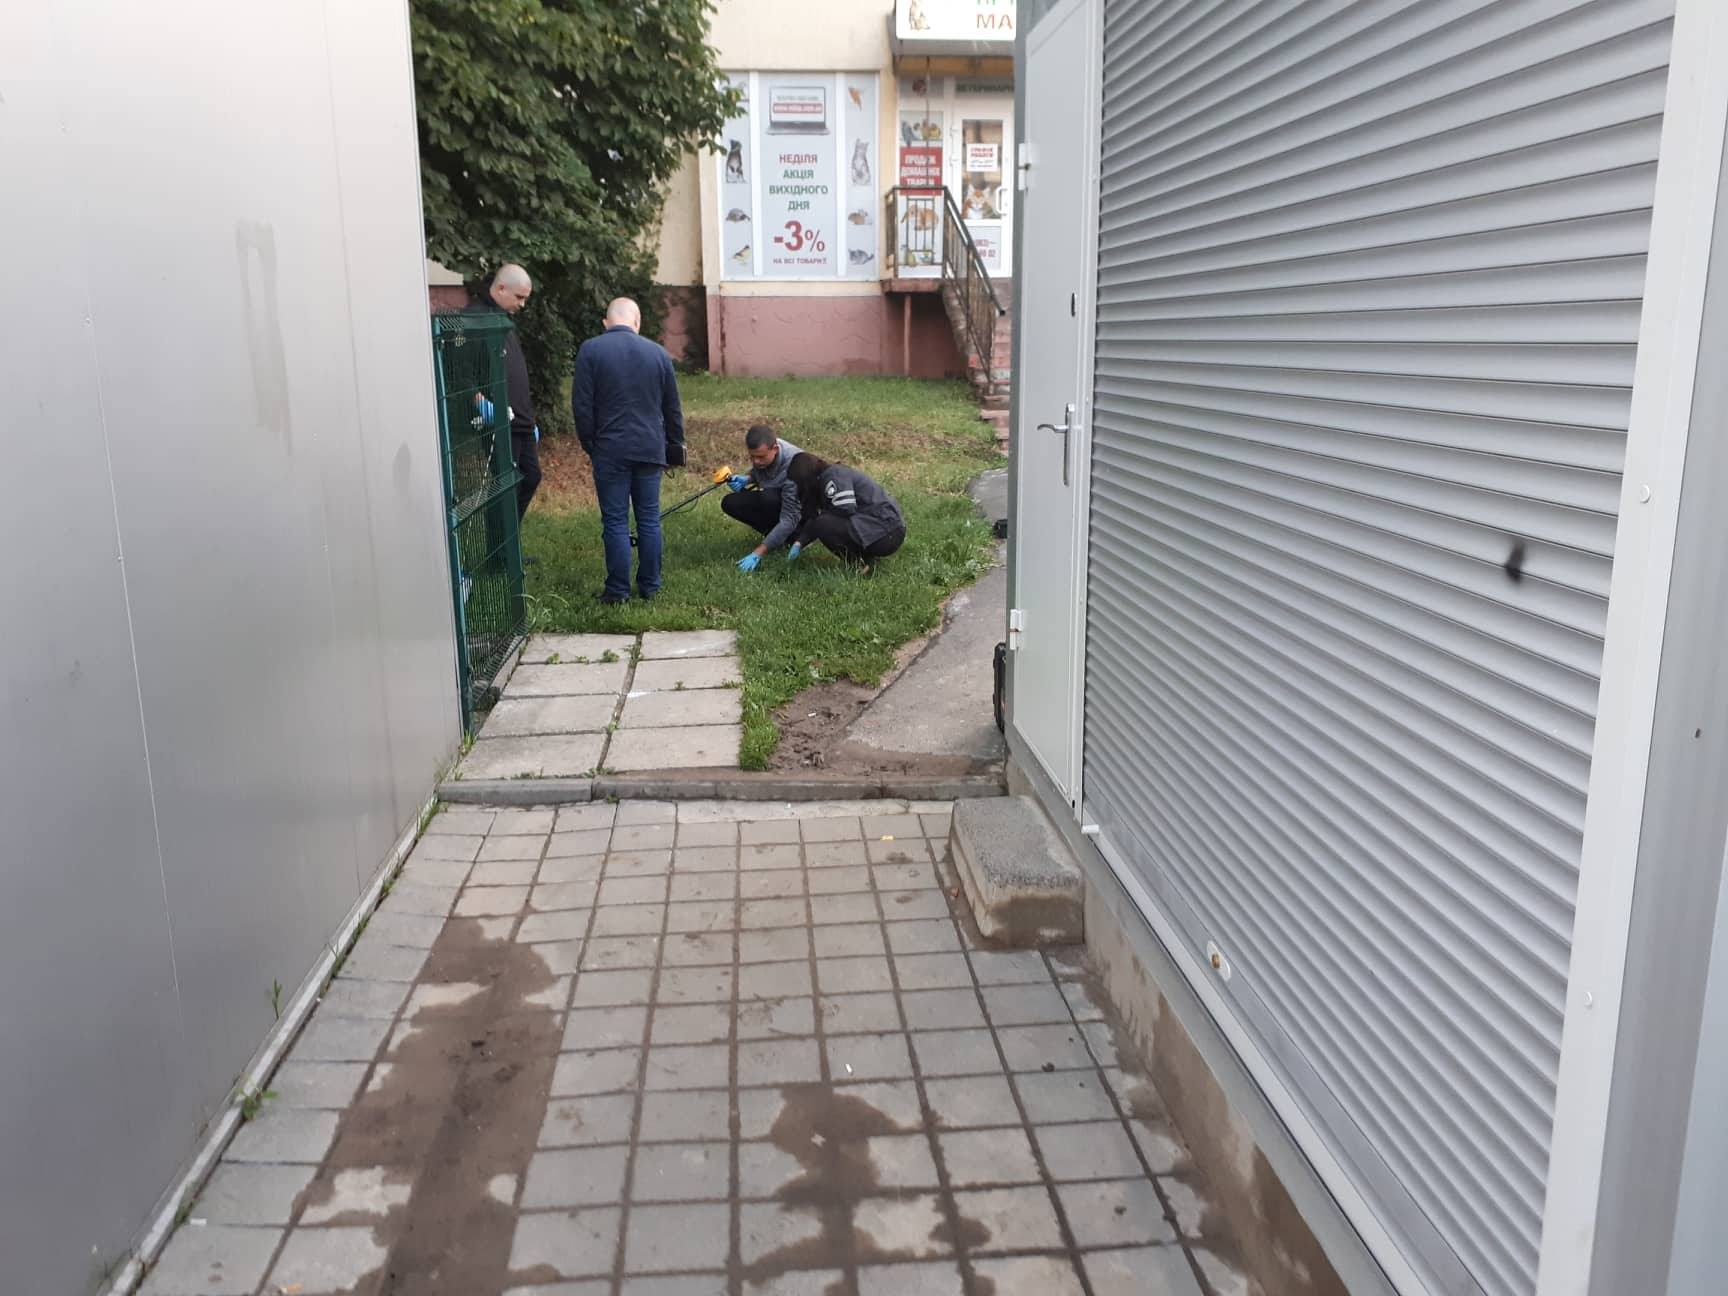 Во Львове на улице застрелили мужчину: фото